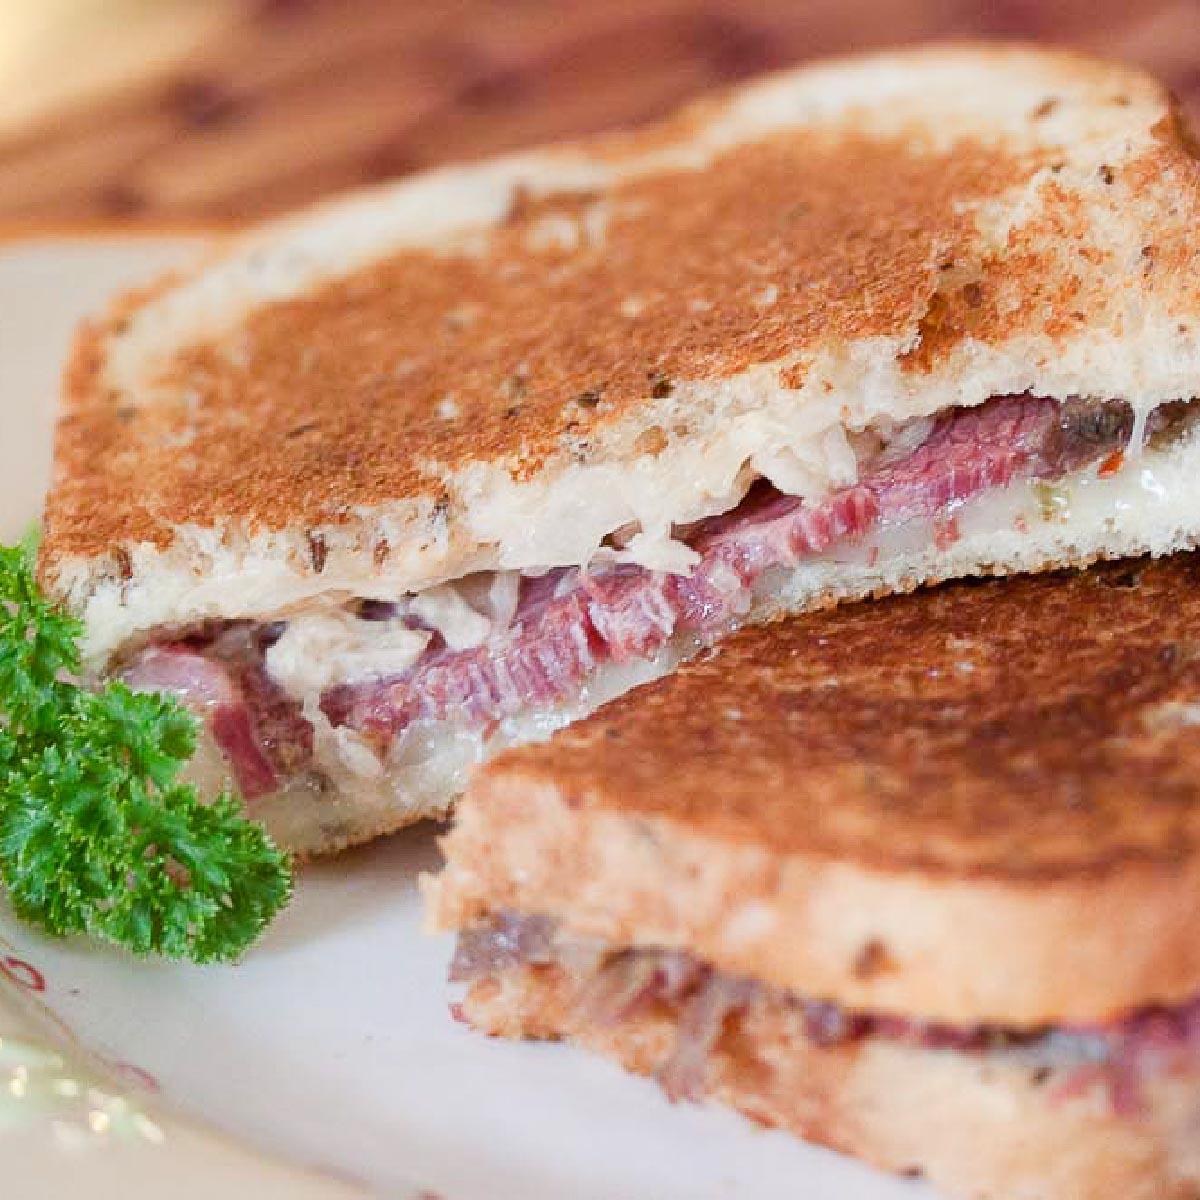 Two Reuben sandwiches on a white plate.